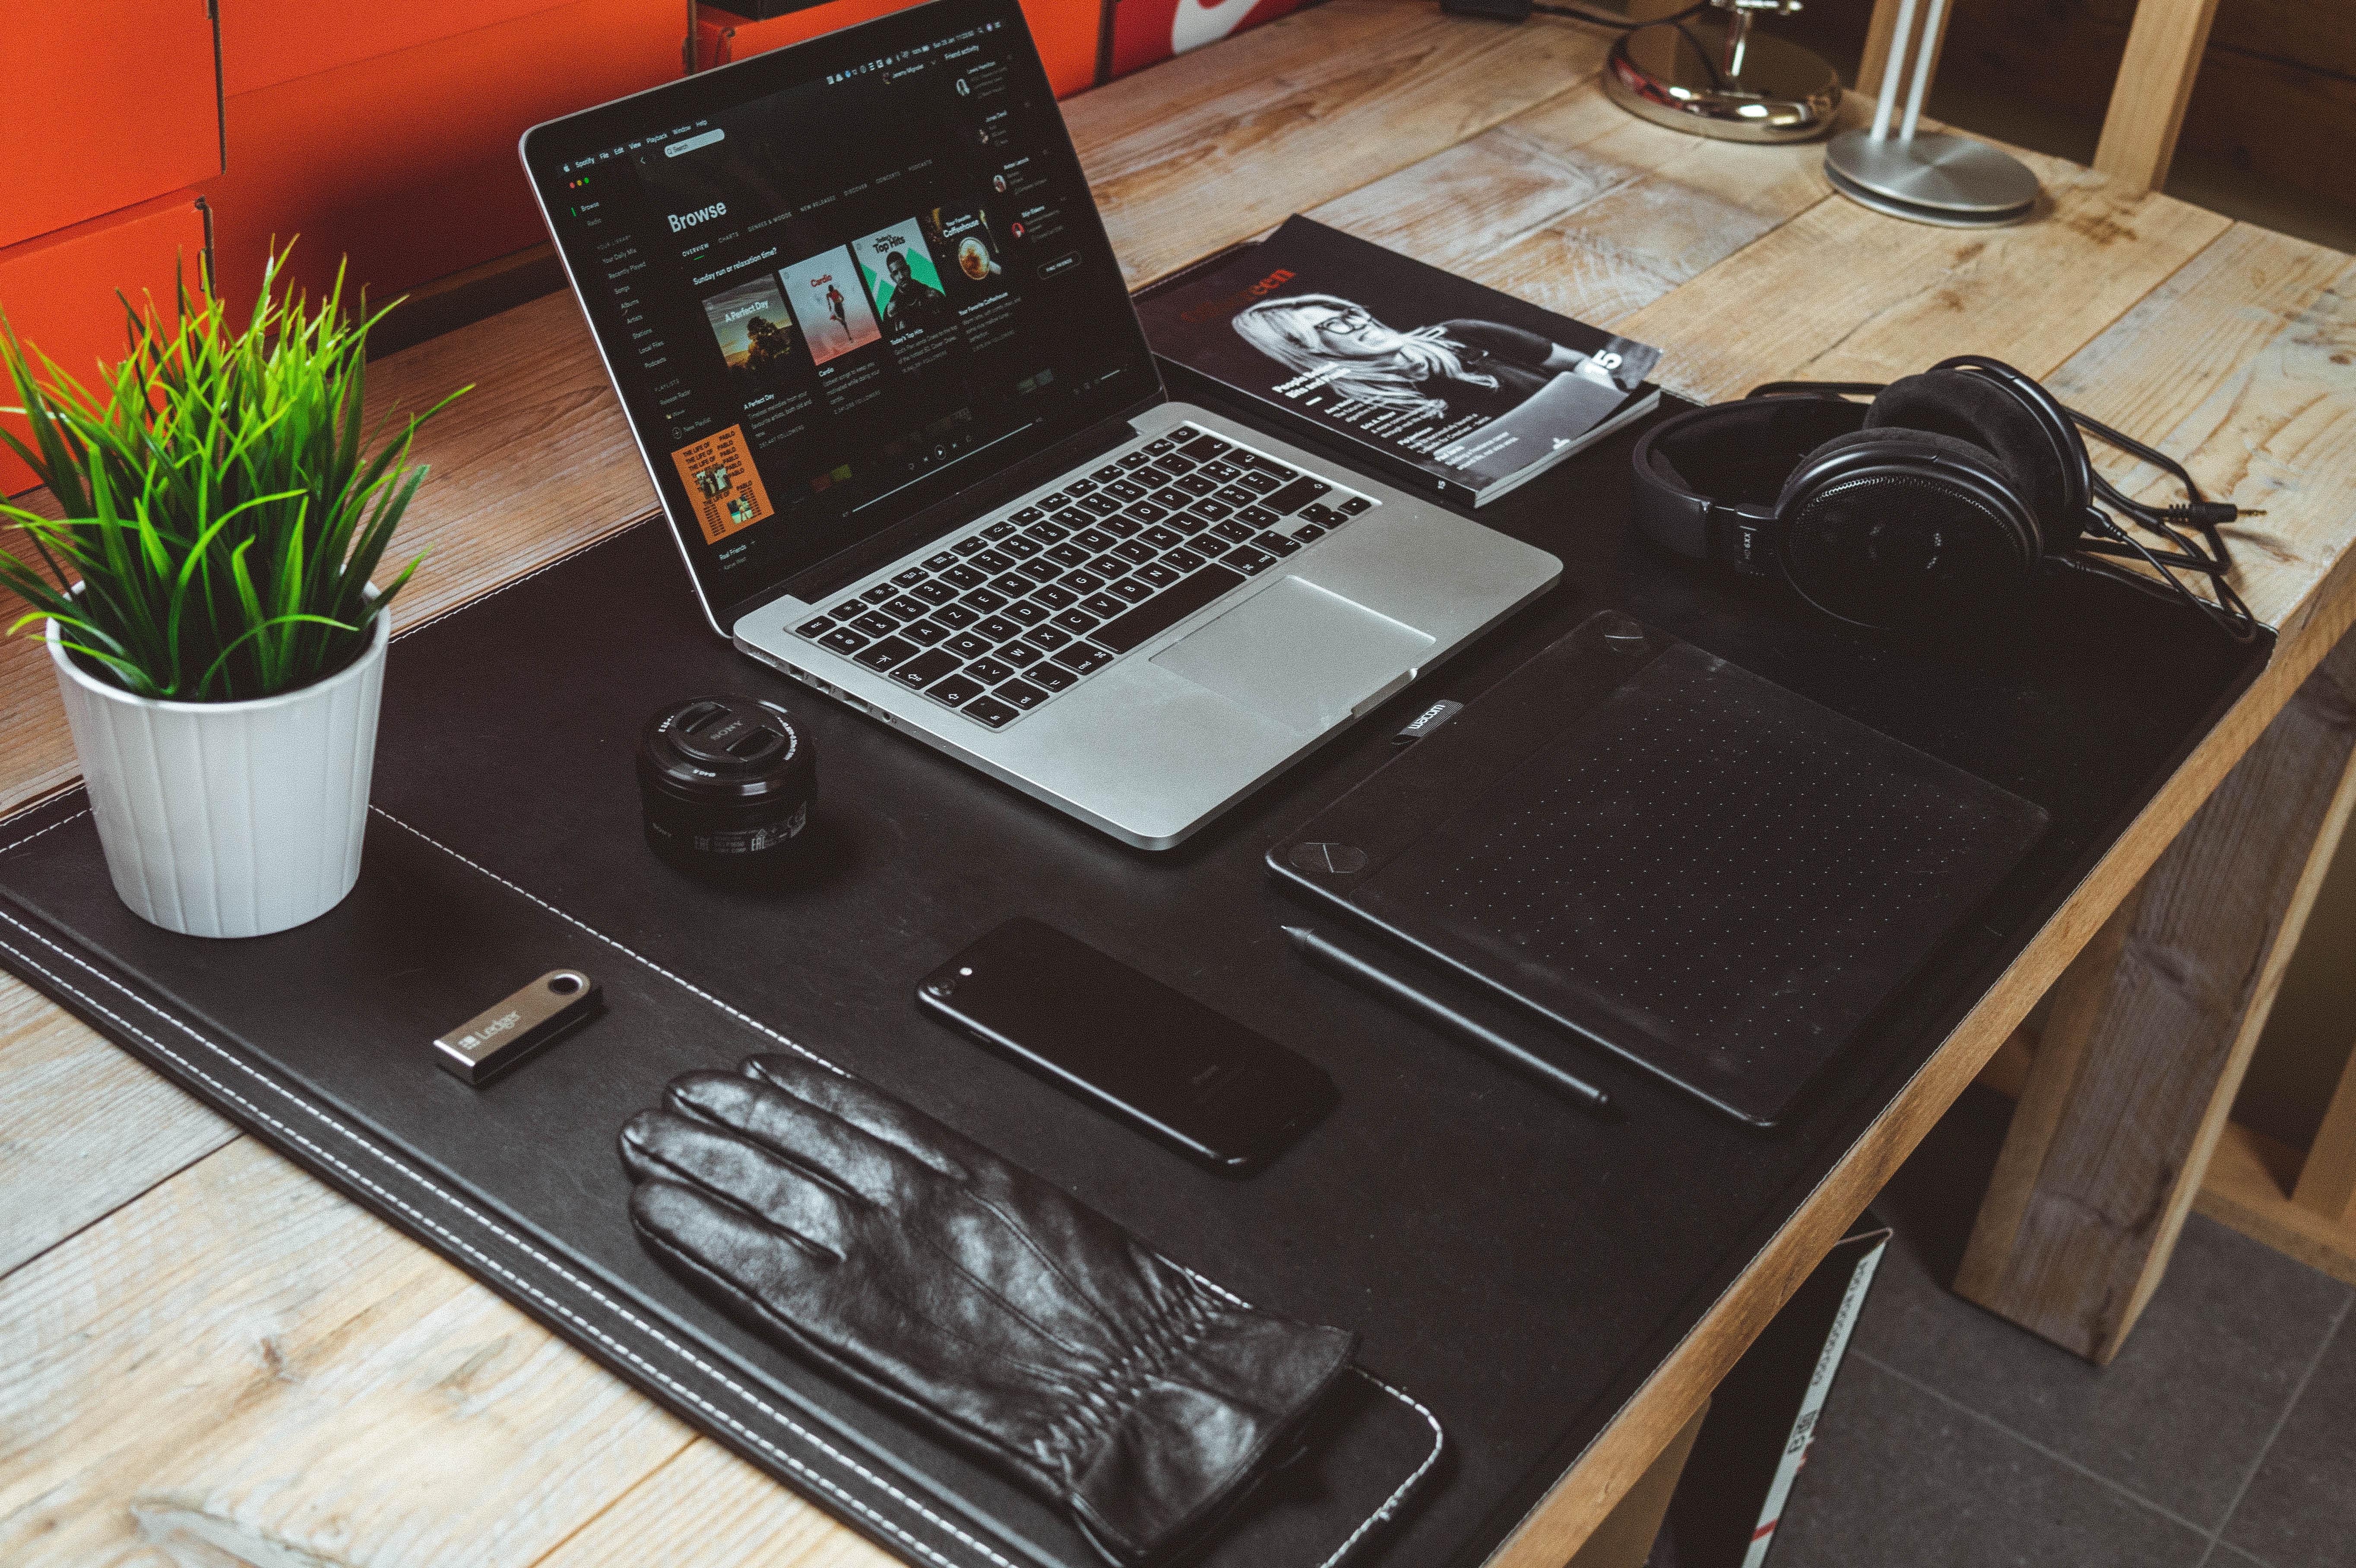 Macbook pro on desk photo